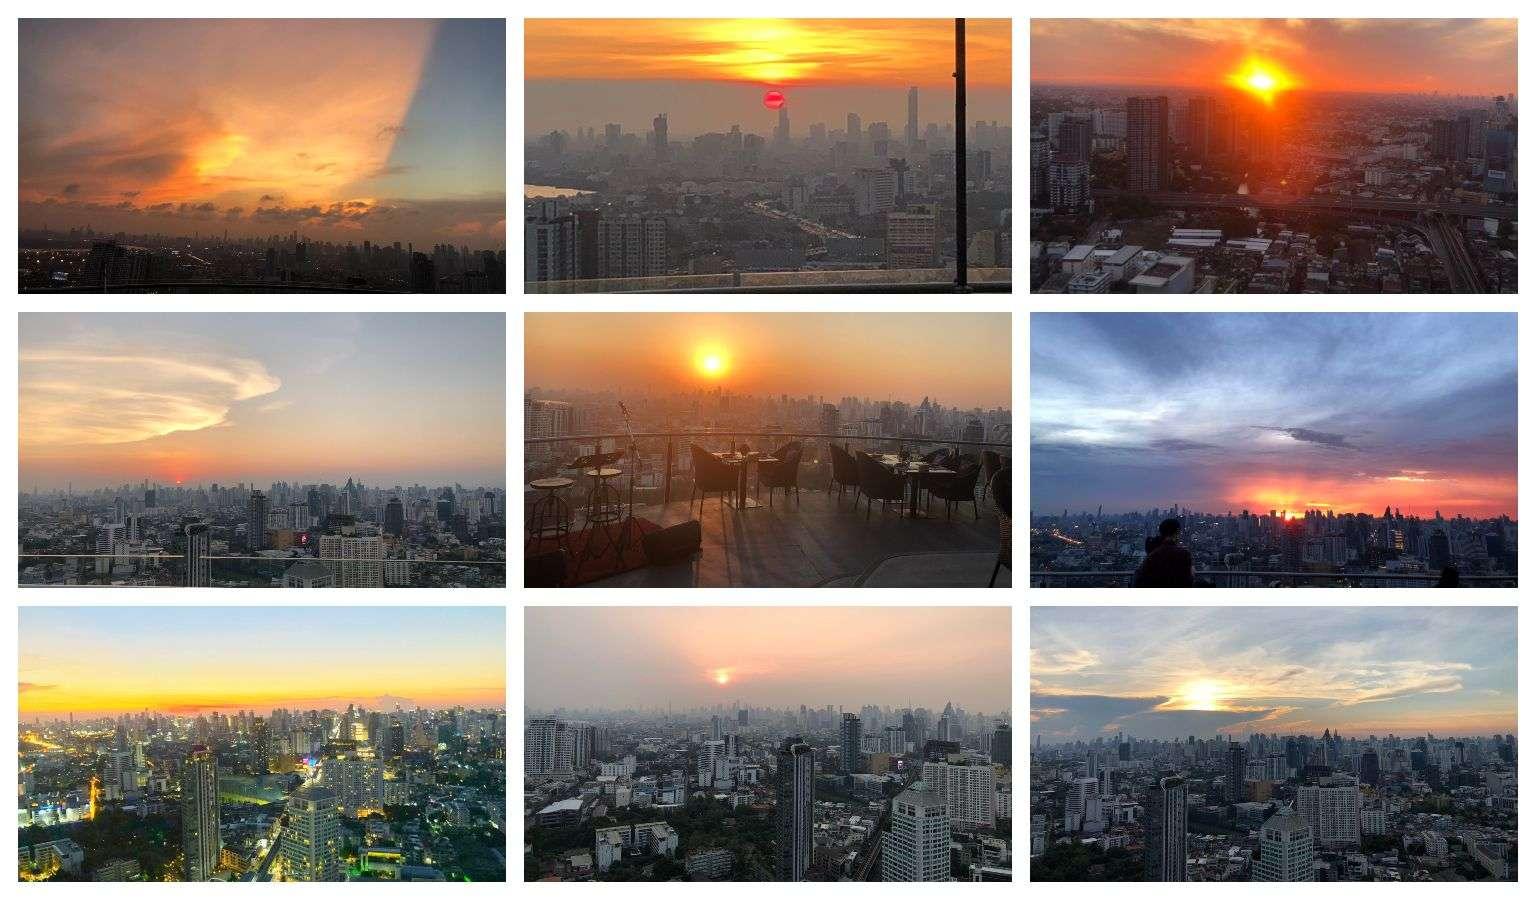 Collage van zonsondergang foto's vanaf Cielo Sky Bar & Restaurant in Bangkok, Thailand